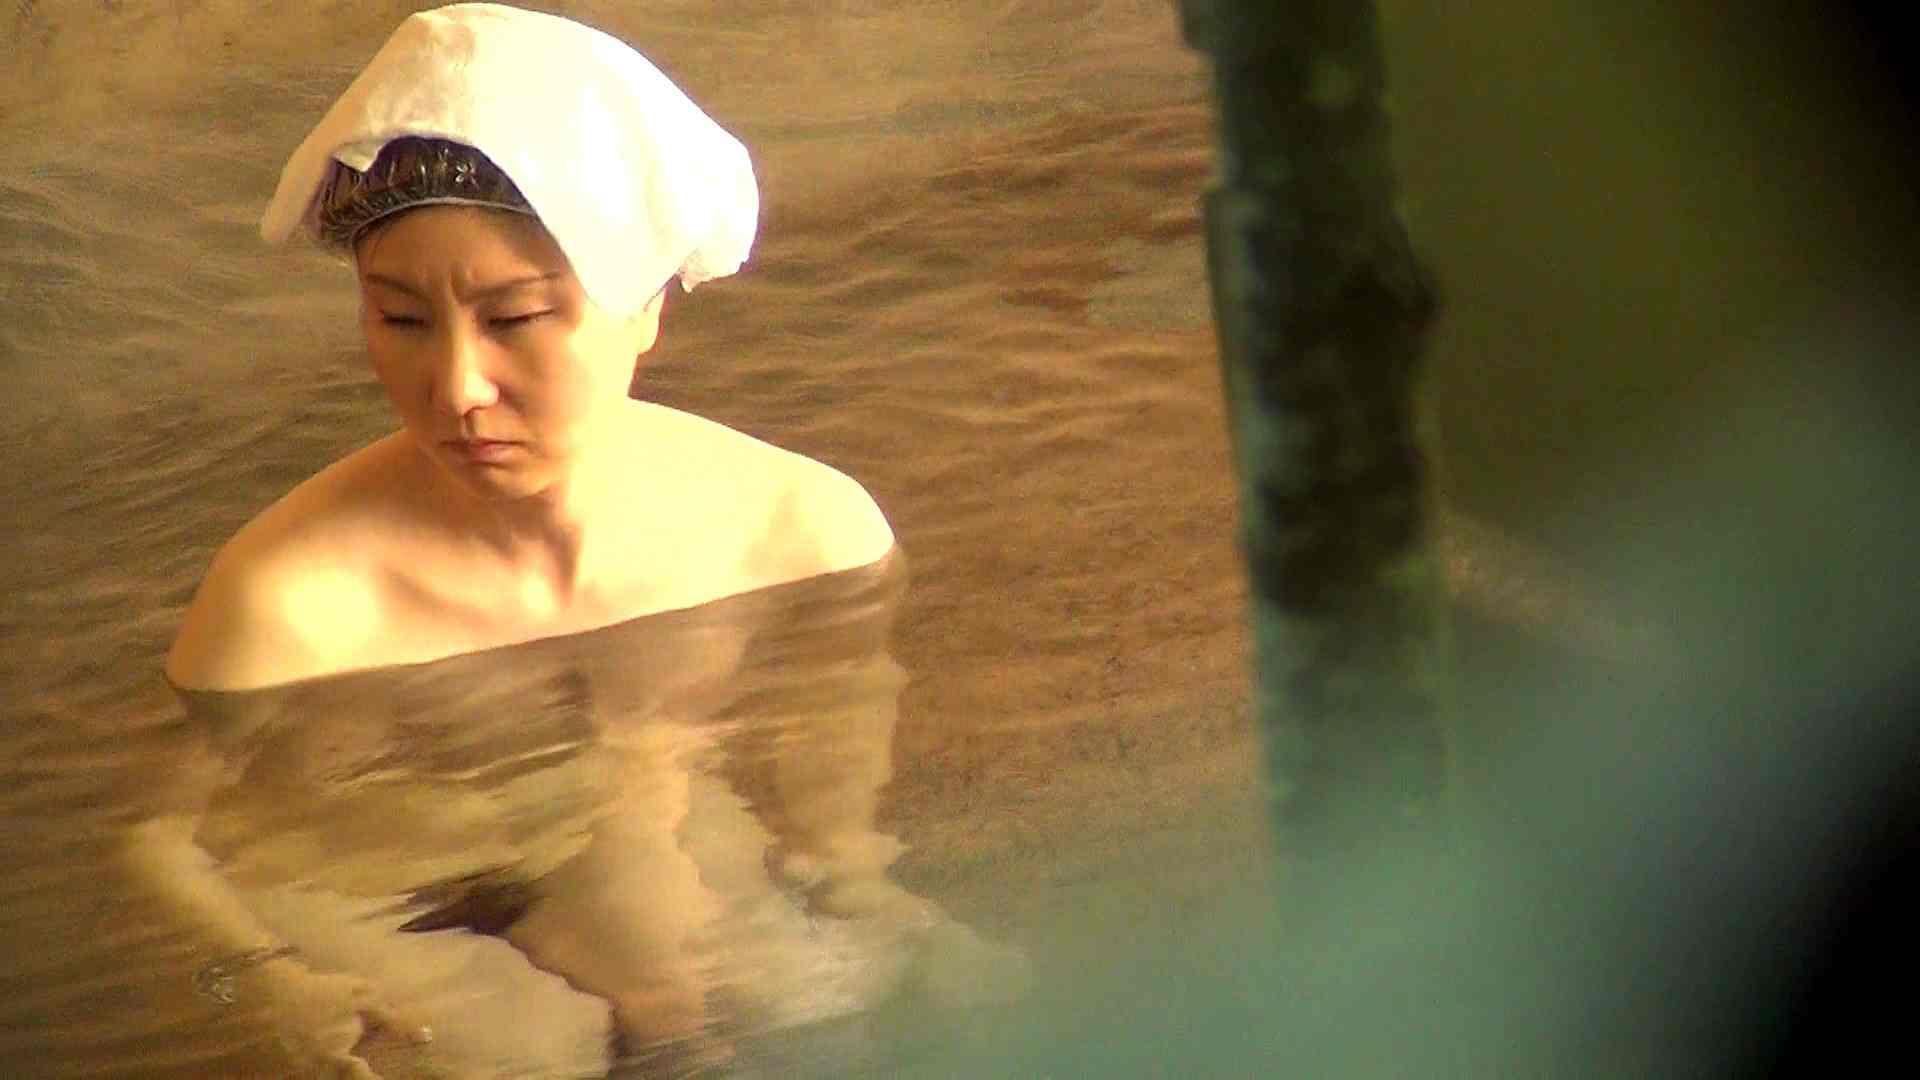 Aquaな露天風呂Vol.278 OLセックス 覗きオメコ動画キャプチャ 100画像 74